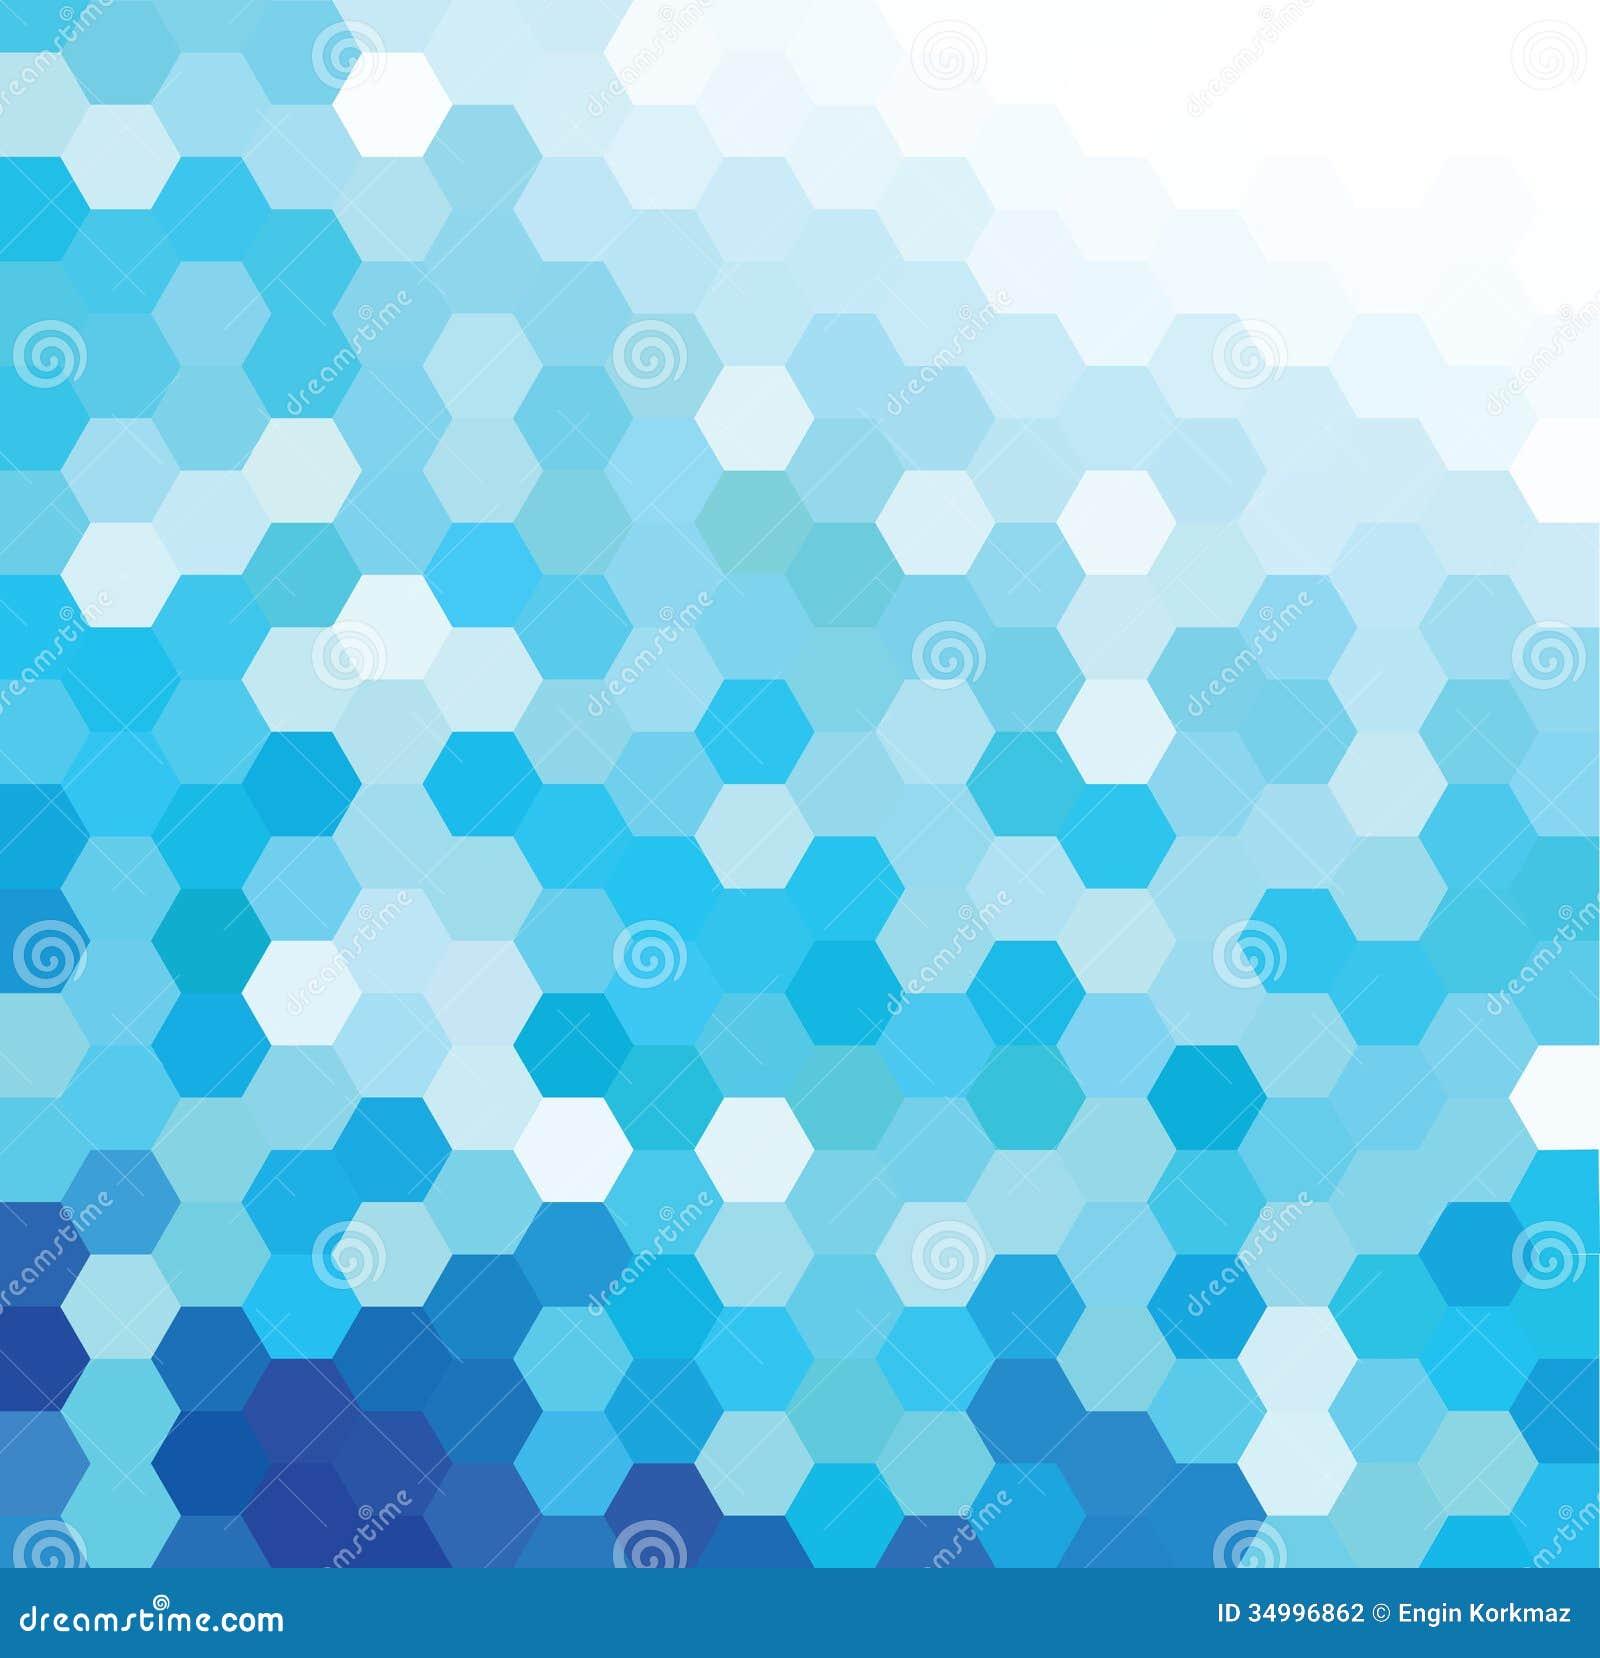 blue-hexagonal-pattern-vector-background-white-34996862 jpgHexagonal Pattern Vector